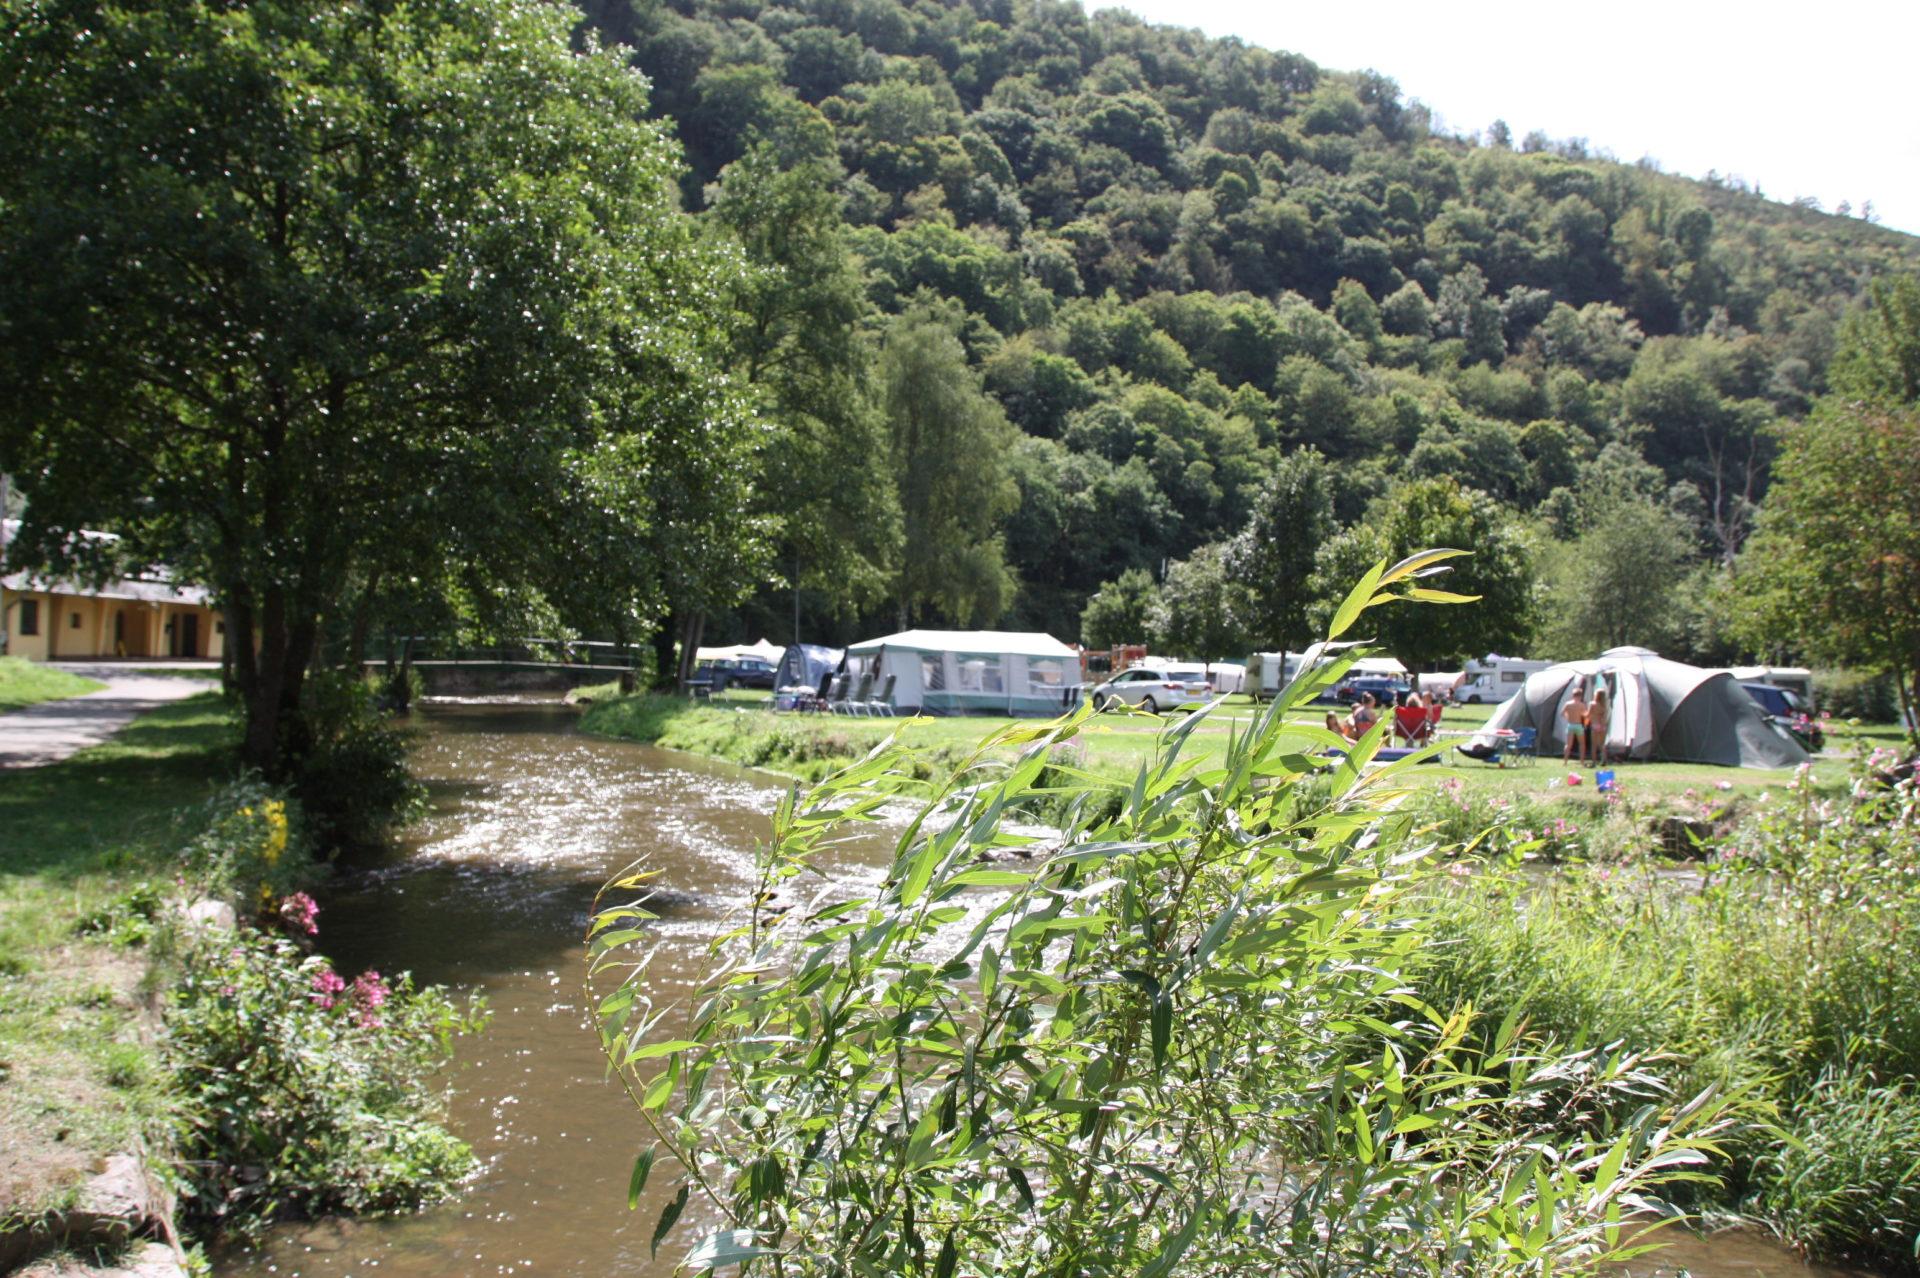 4 saisons - Camping Kautenbach